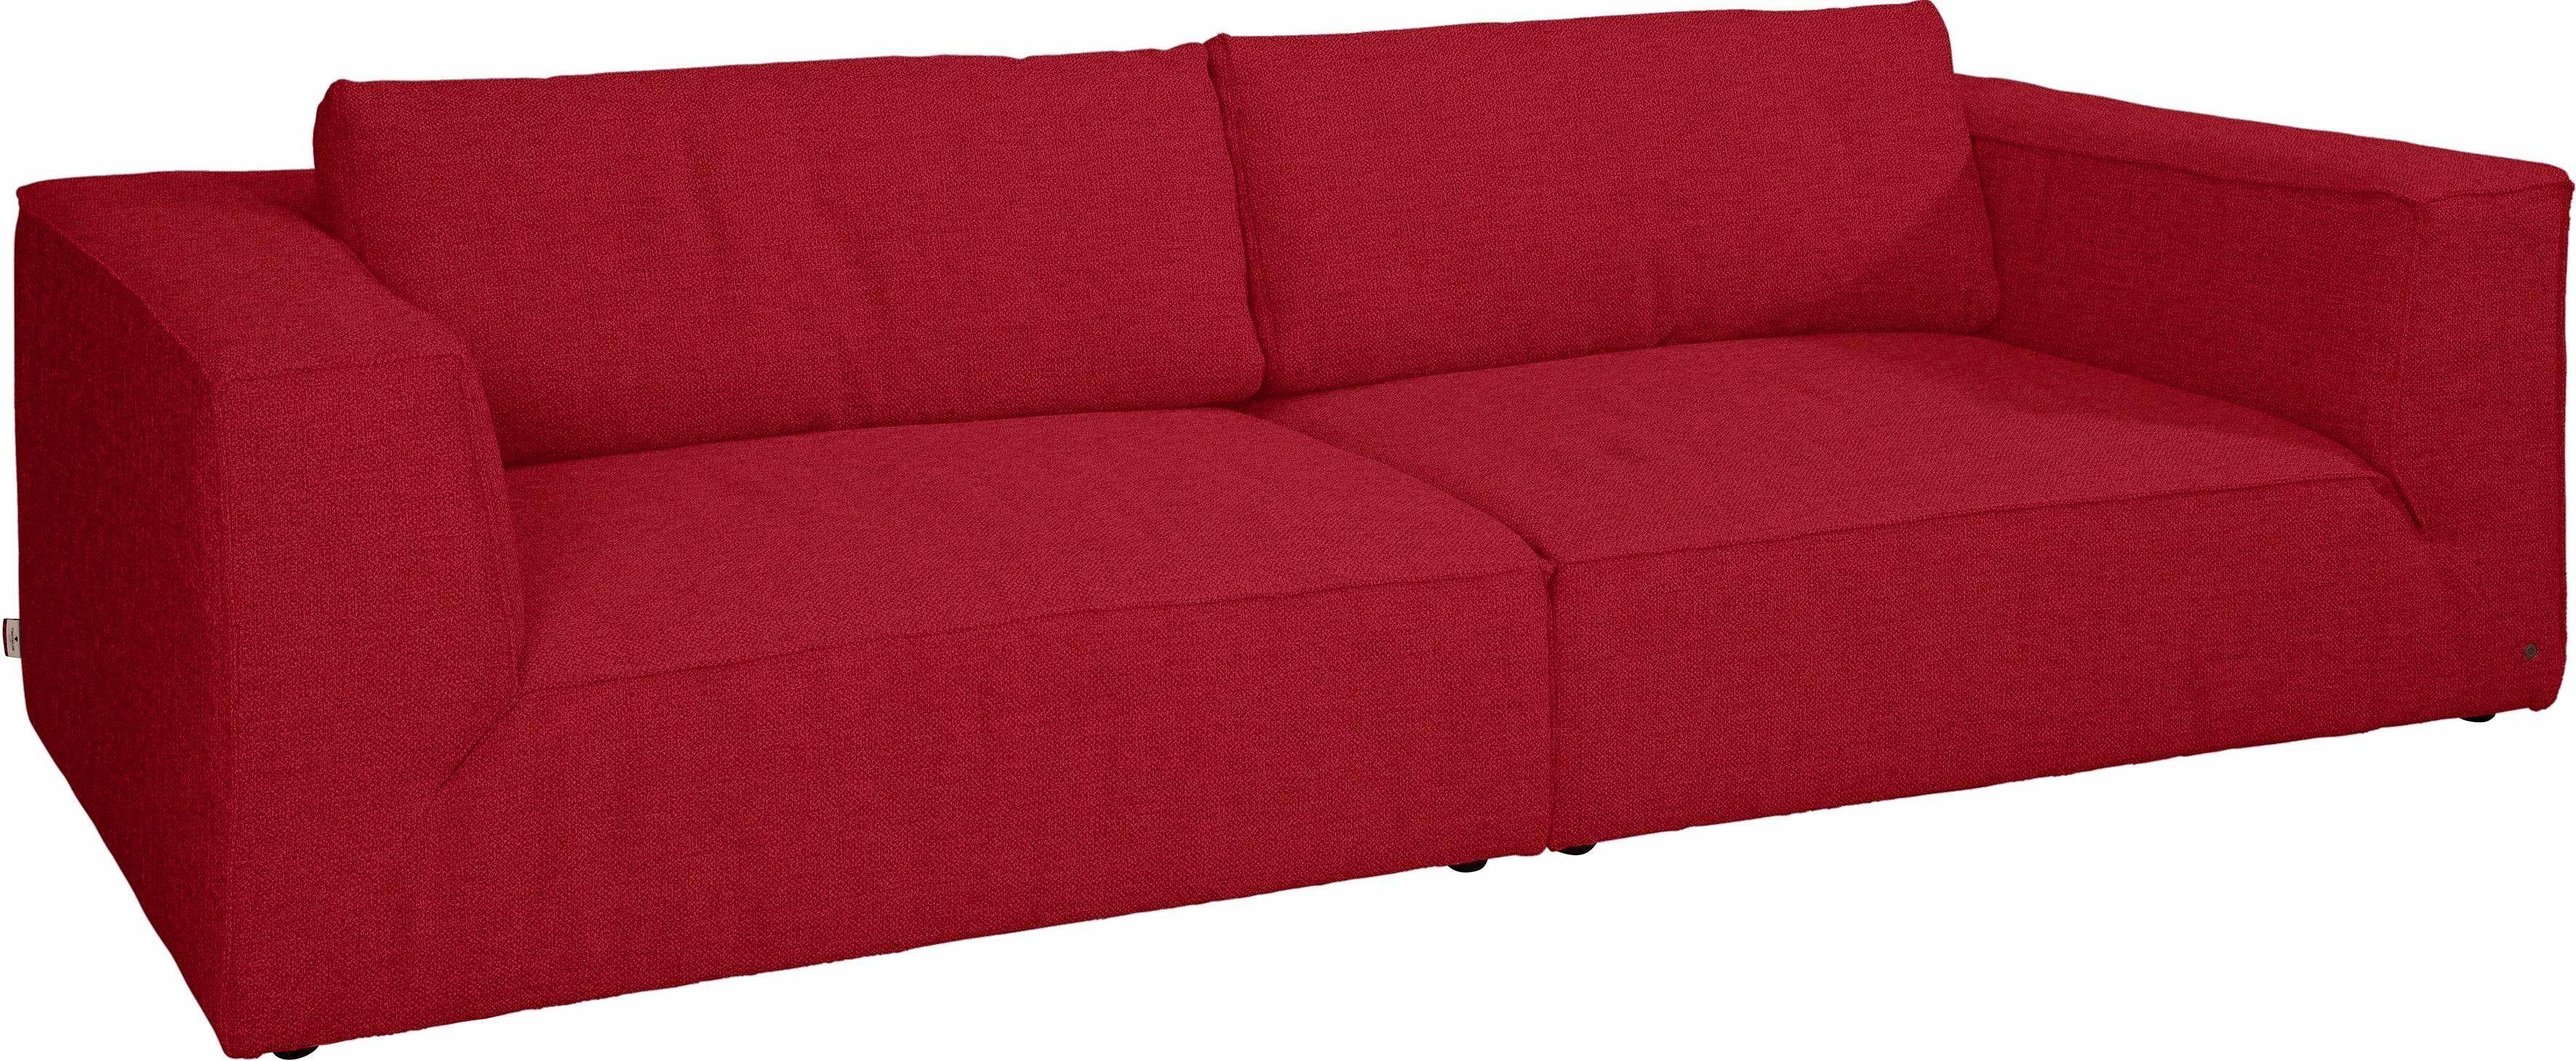 TOM TAILOR Big Sofa Rot, »BIG CUBE STYLE« Jetzt Bestellen Unter: Https